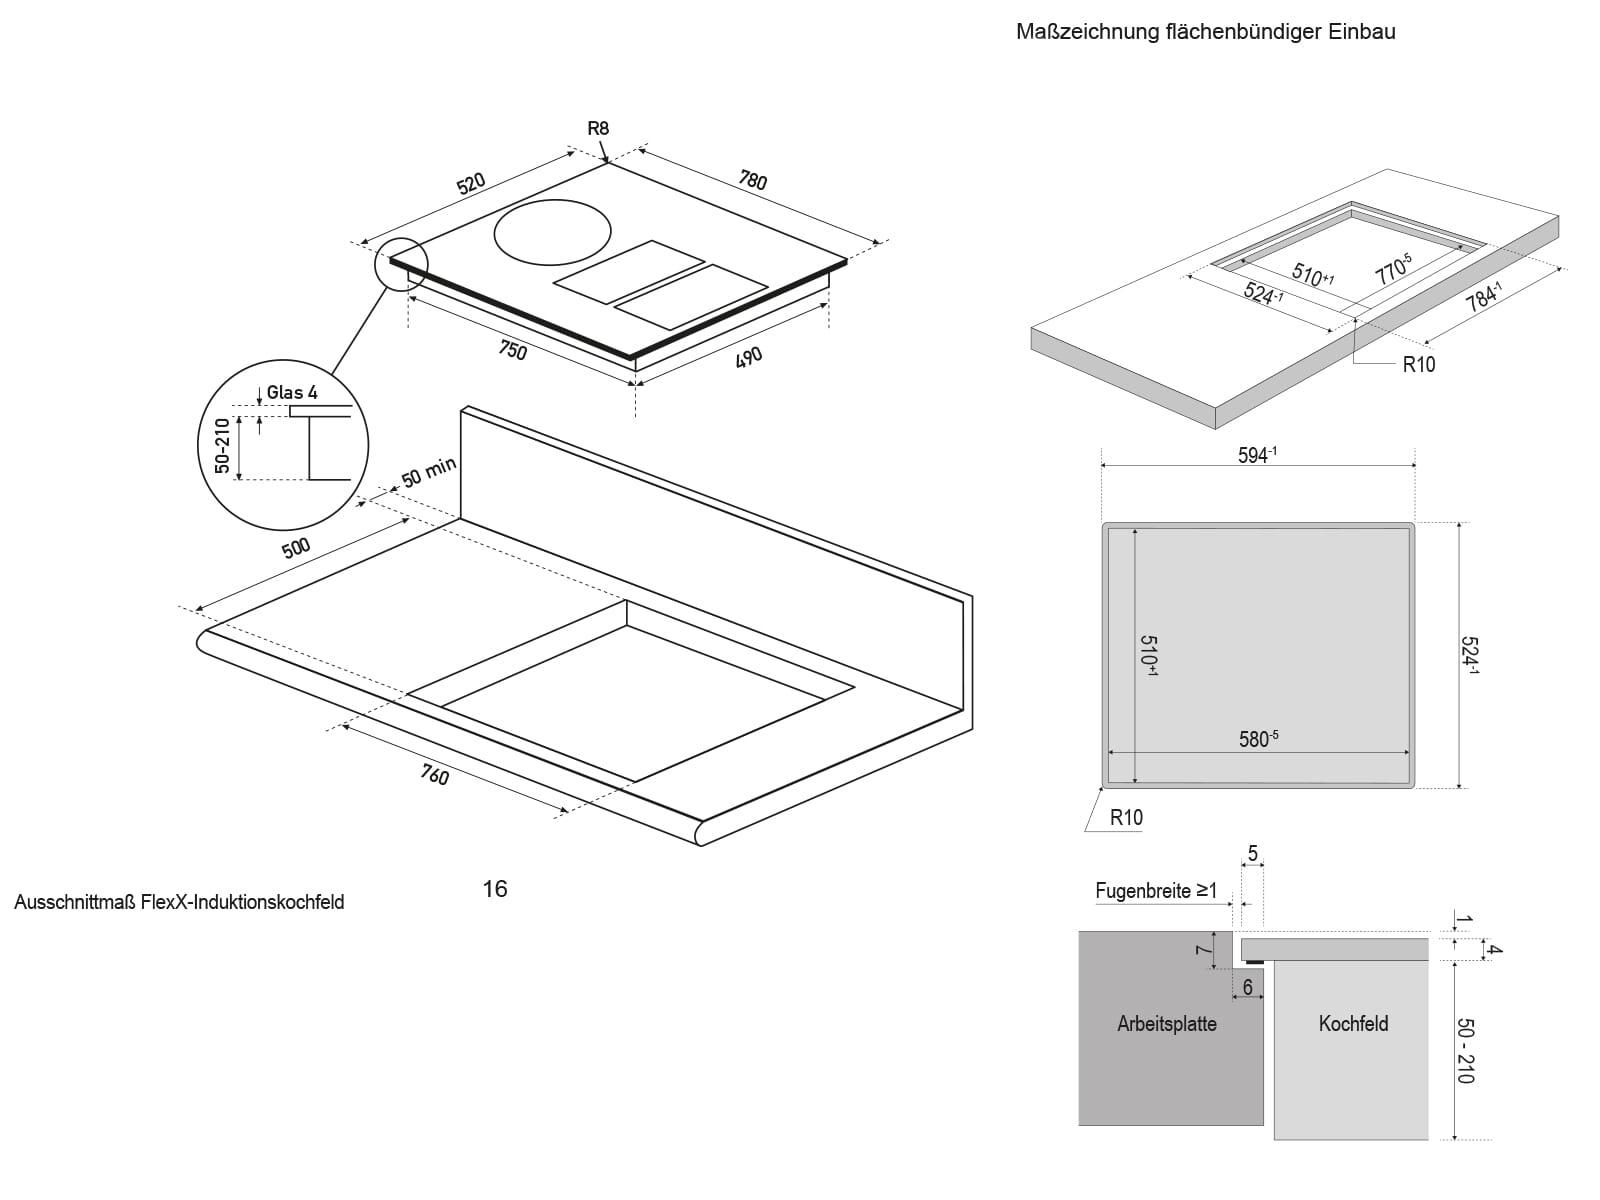 Oranier KXI 1082 Basic-PLUS - 1082 80 Induktionskochfeld-Dunstabzug-Kombination